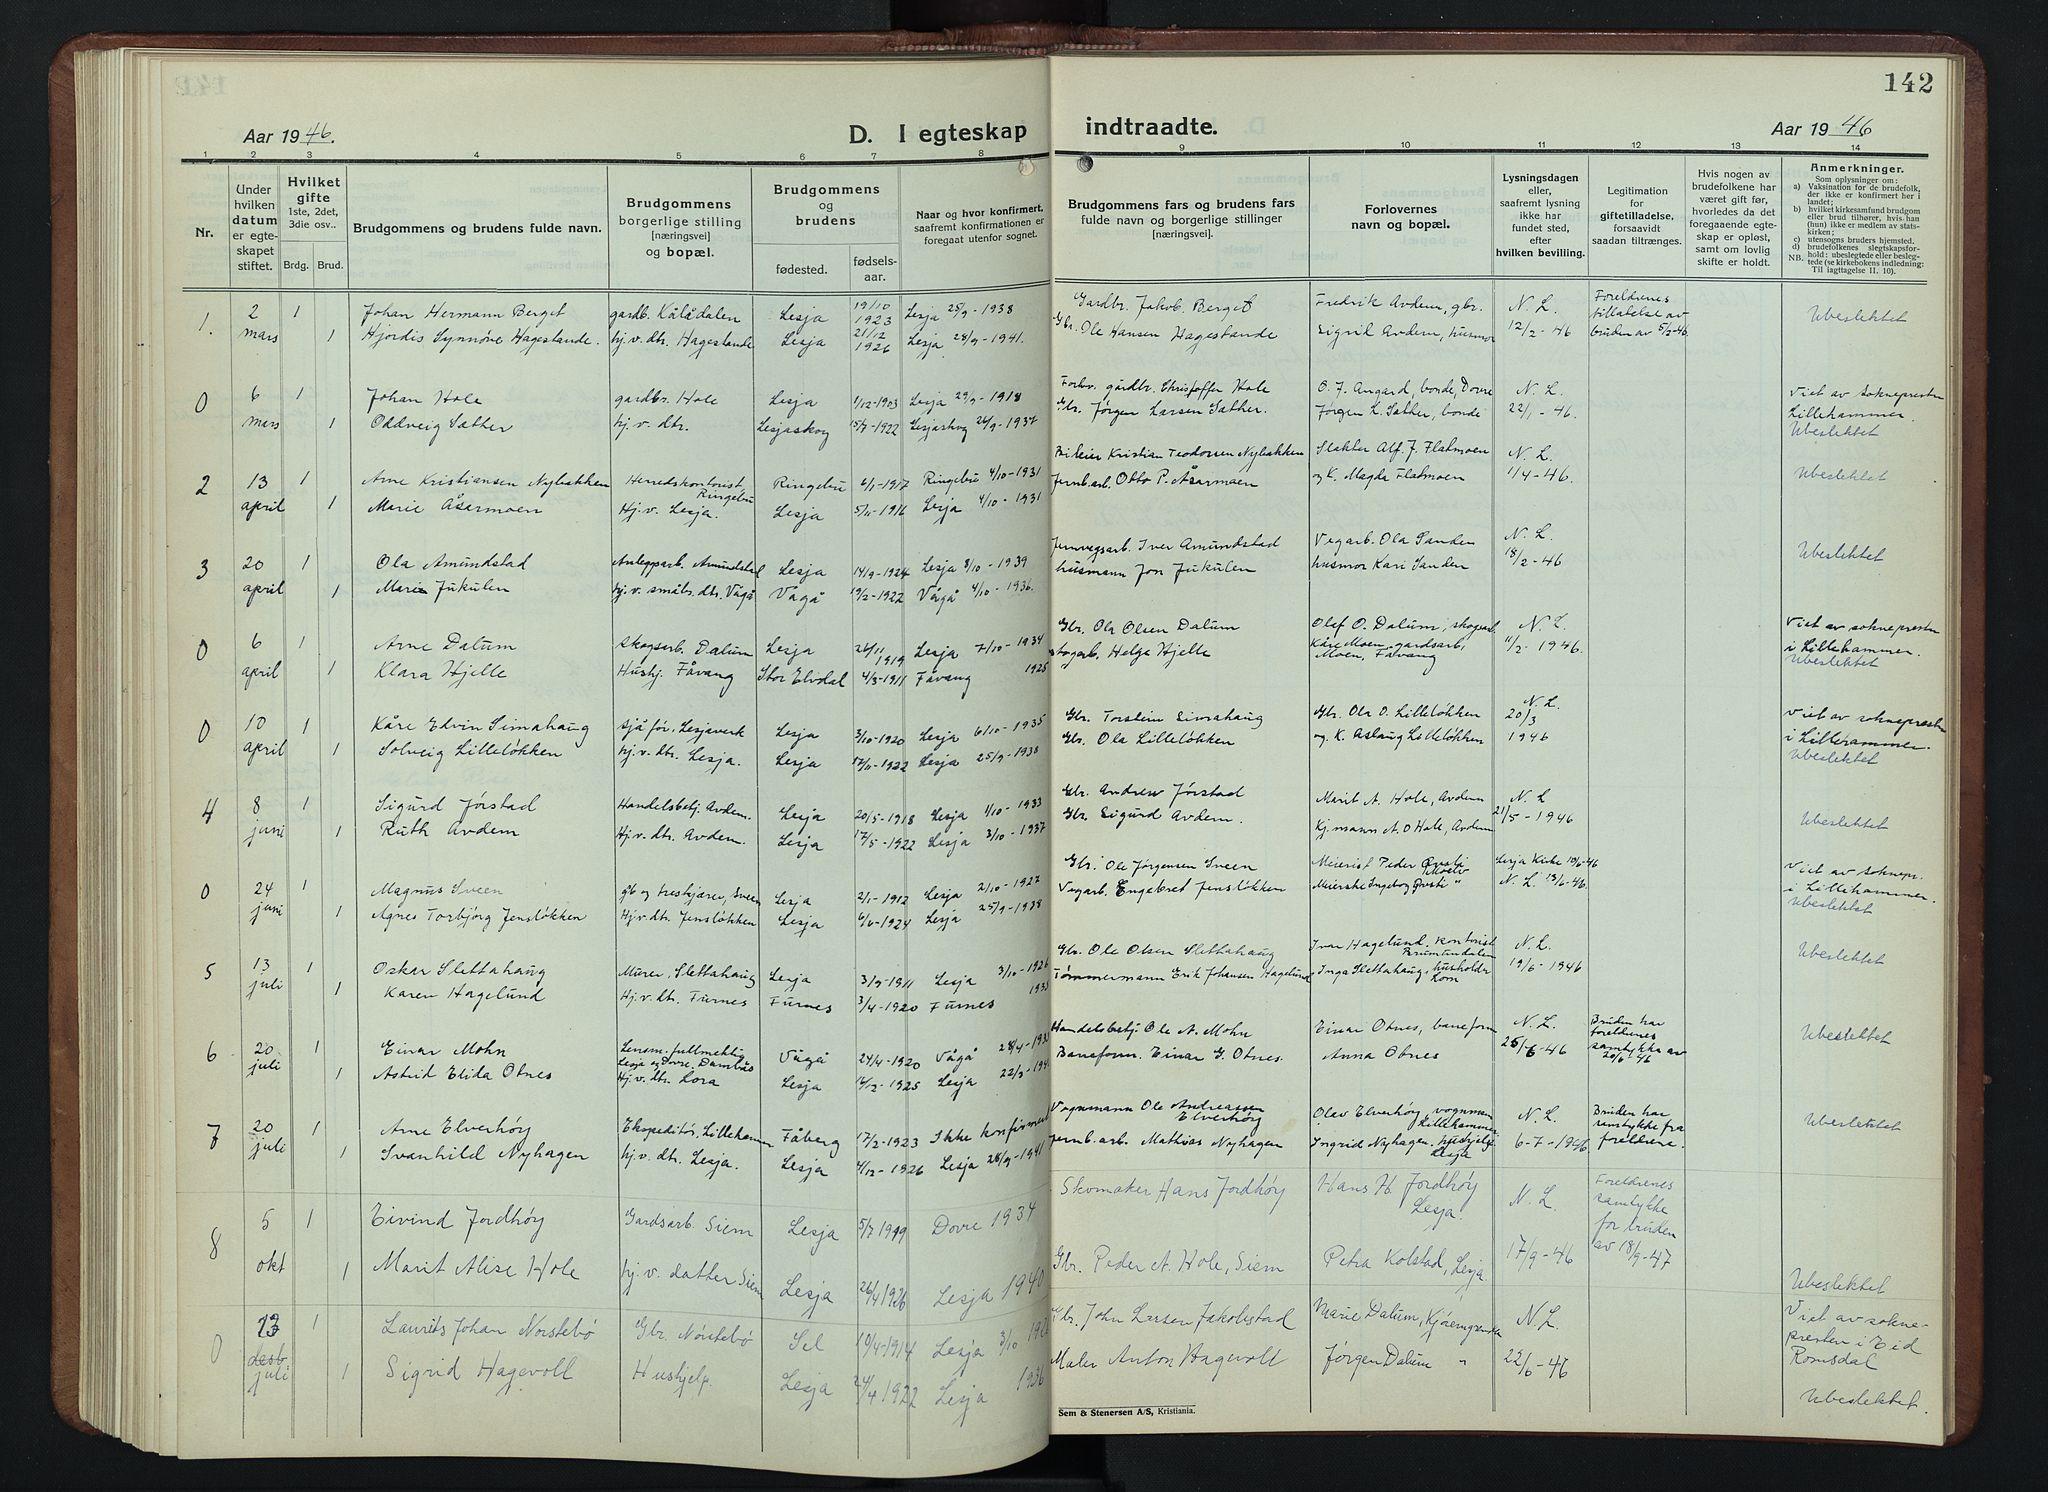 SAH, Lesja prestekontor, Klokkerbok nr. 9, 1924-1947, s. 142